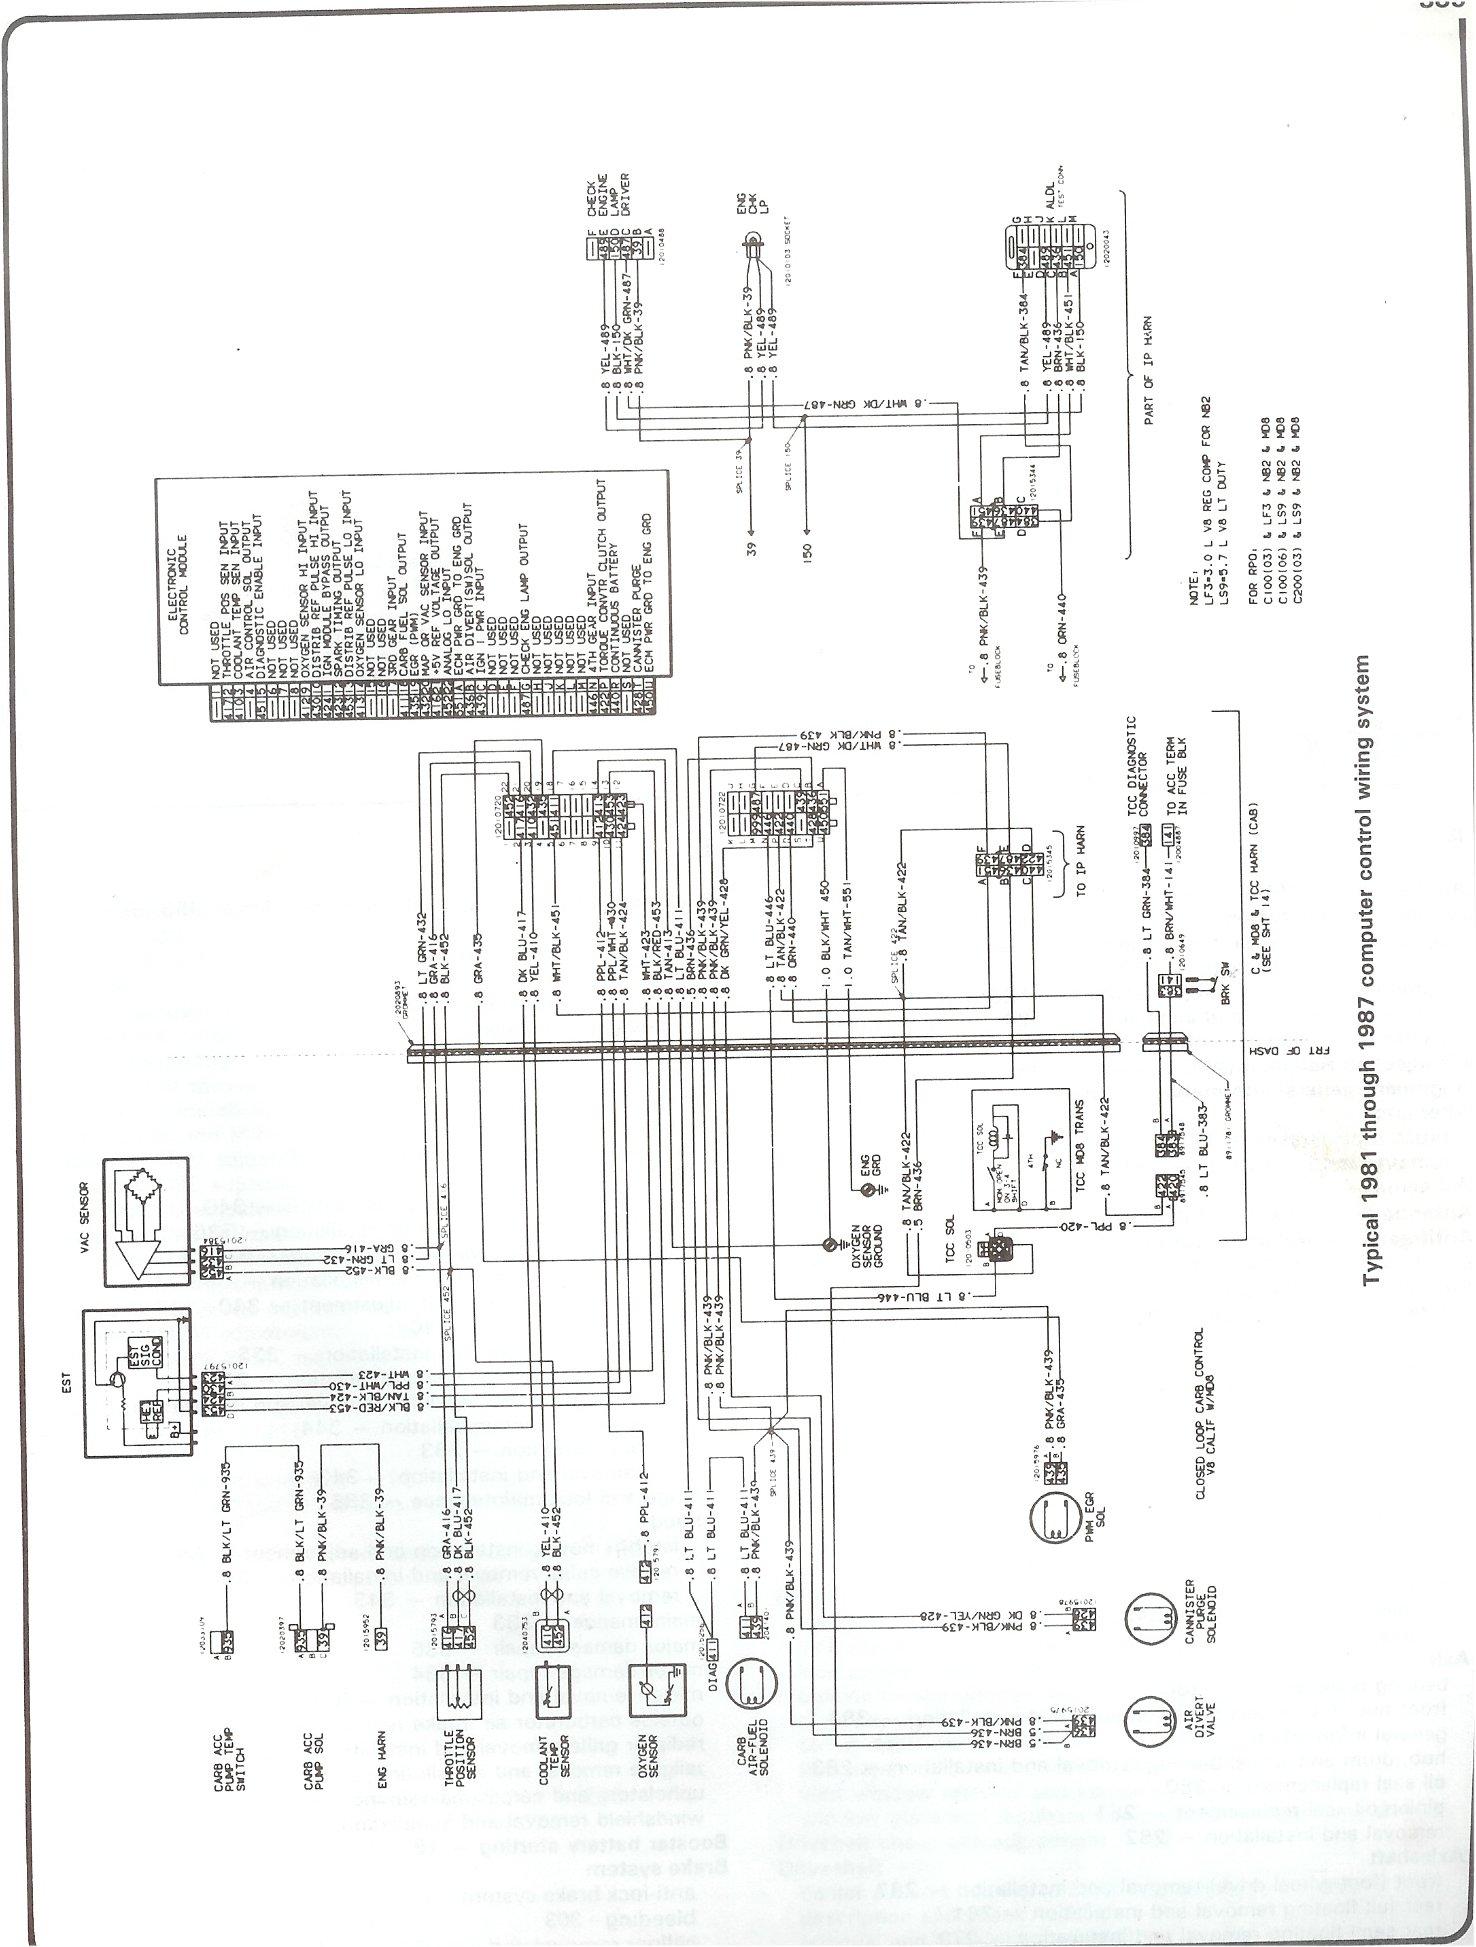 1981 chevy wiring diagram free printable wiring diagrams